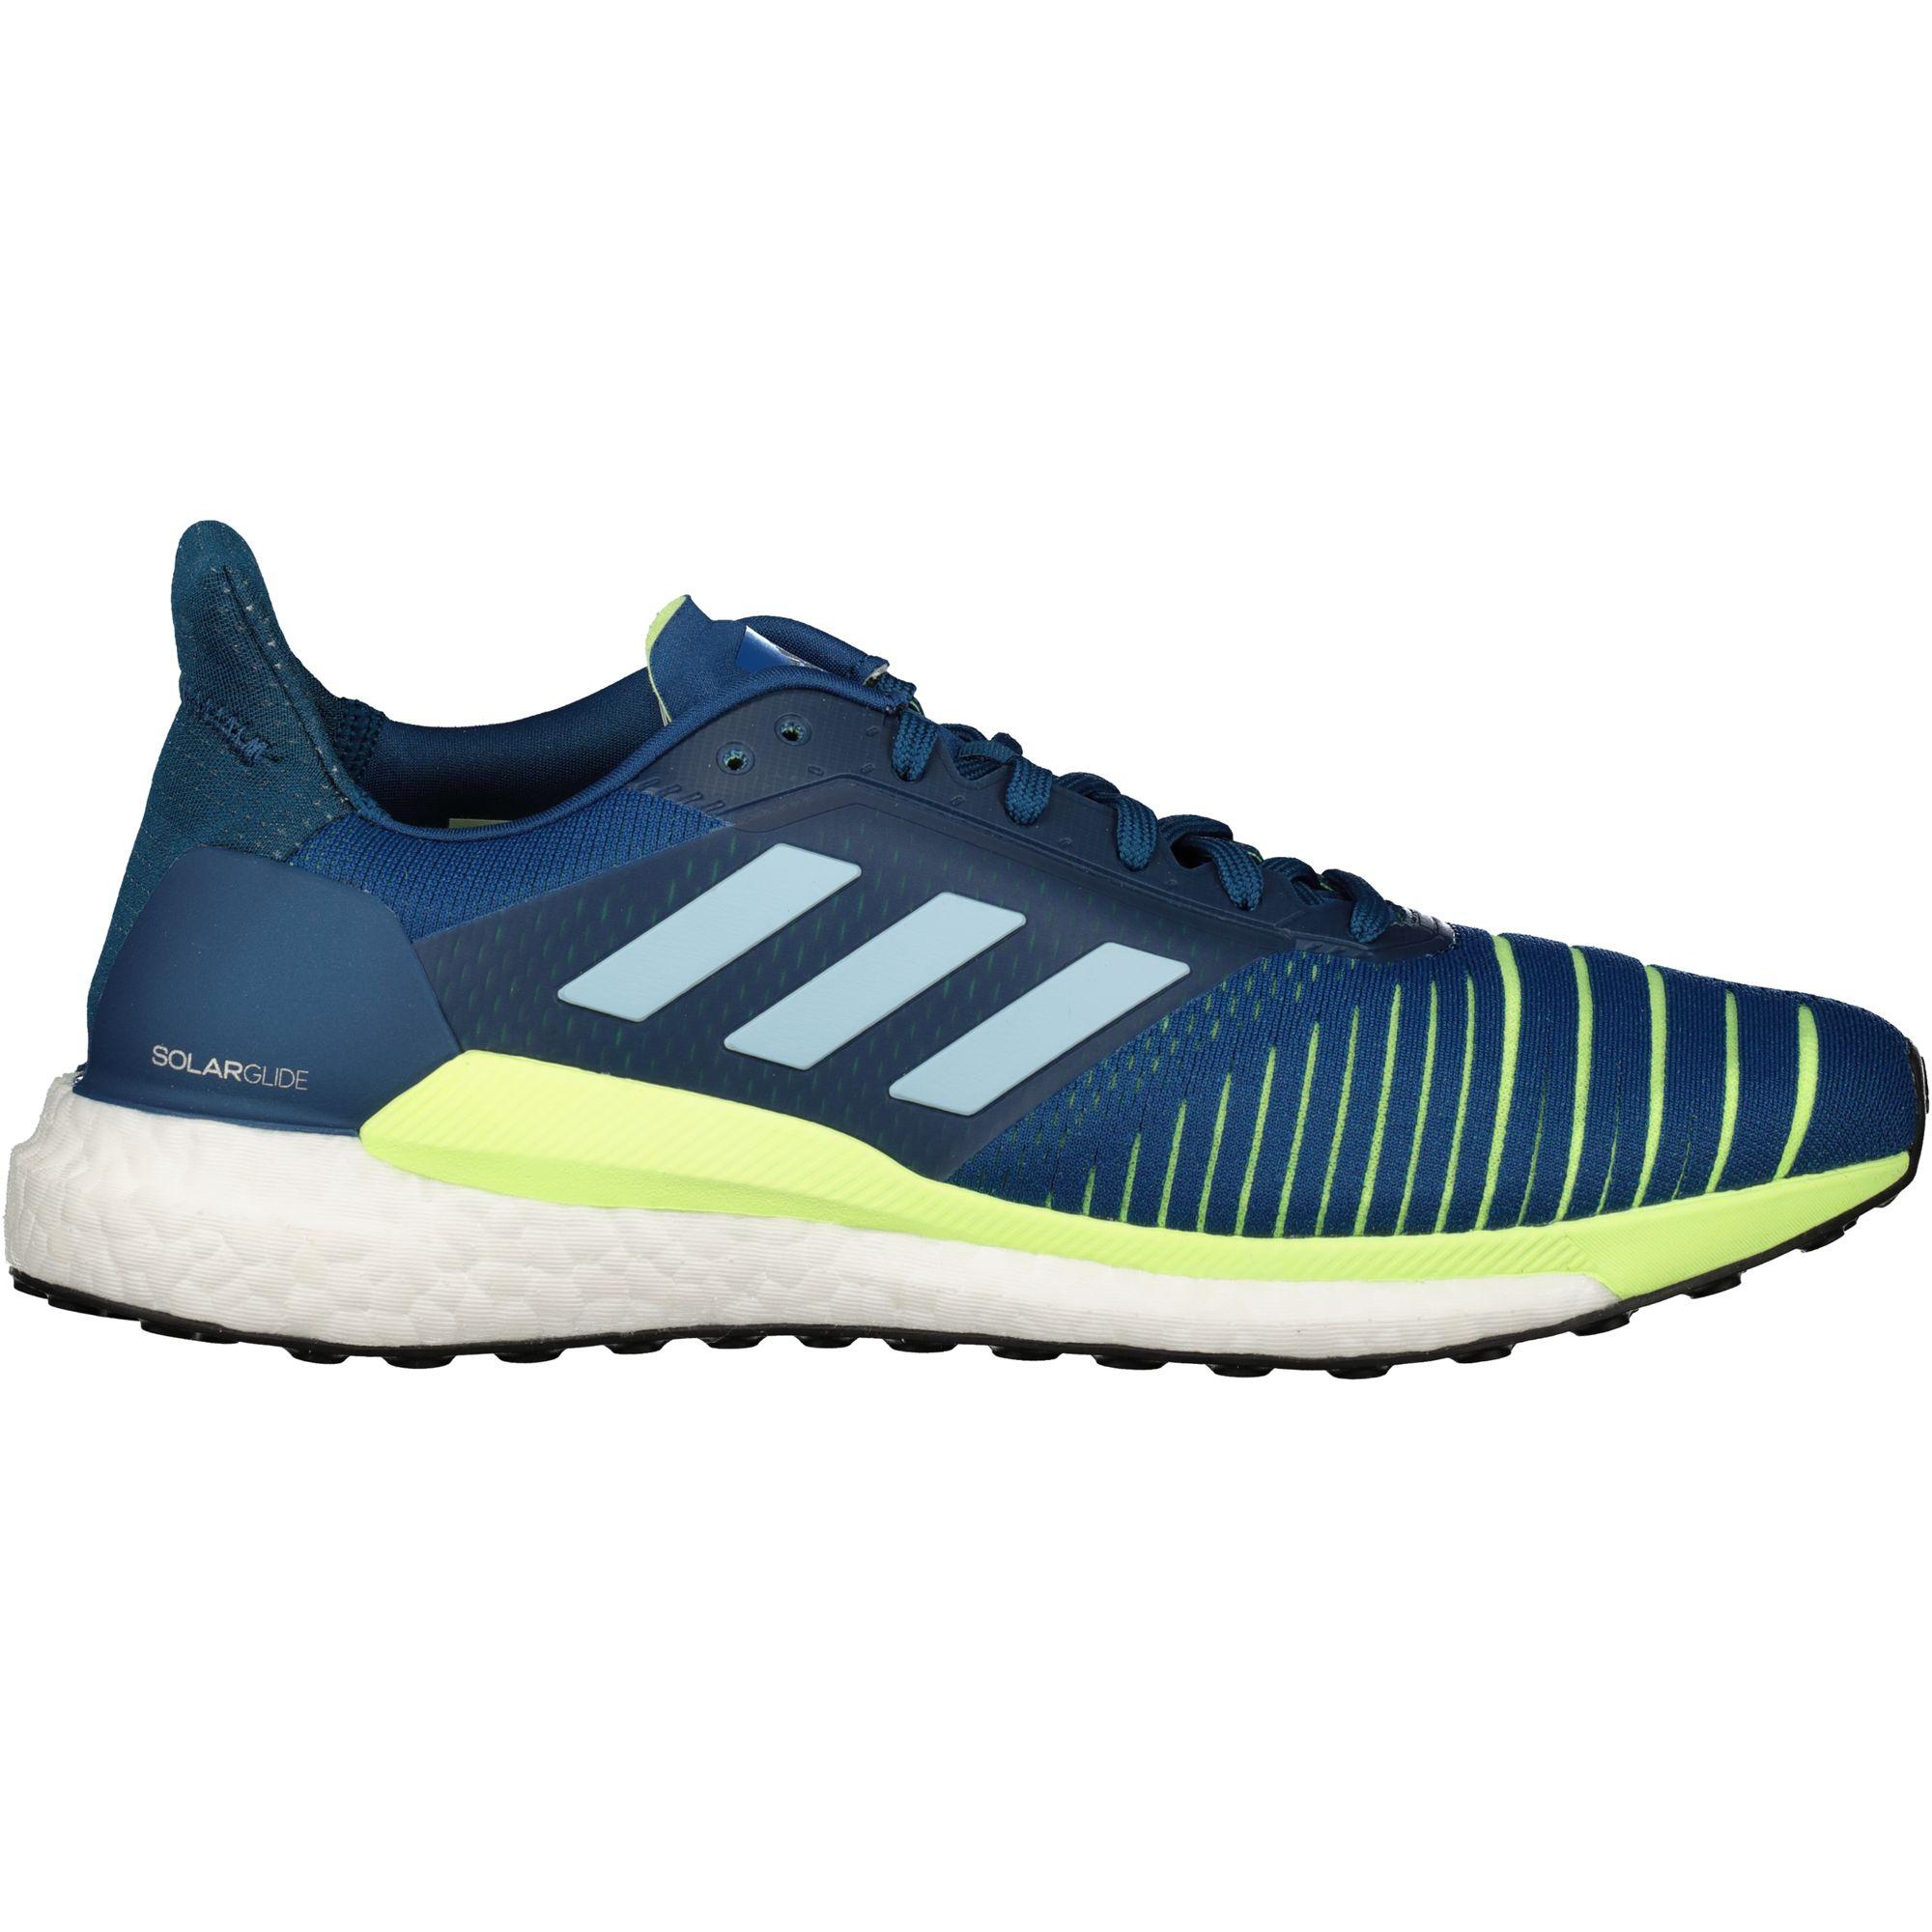 Details zu adidas performance Laufschuhe Herren Solar Glide M legmar Schuhe